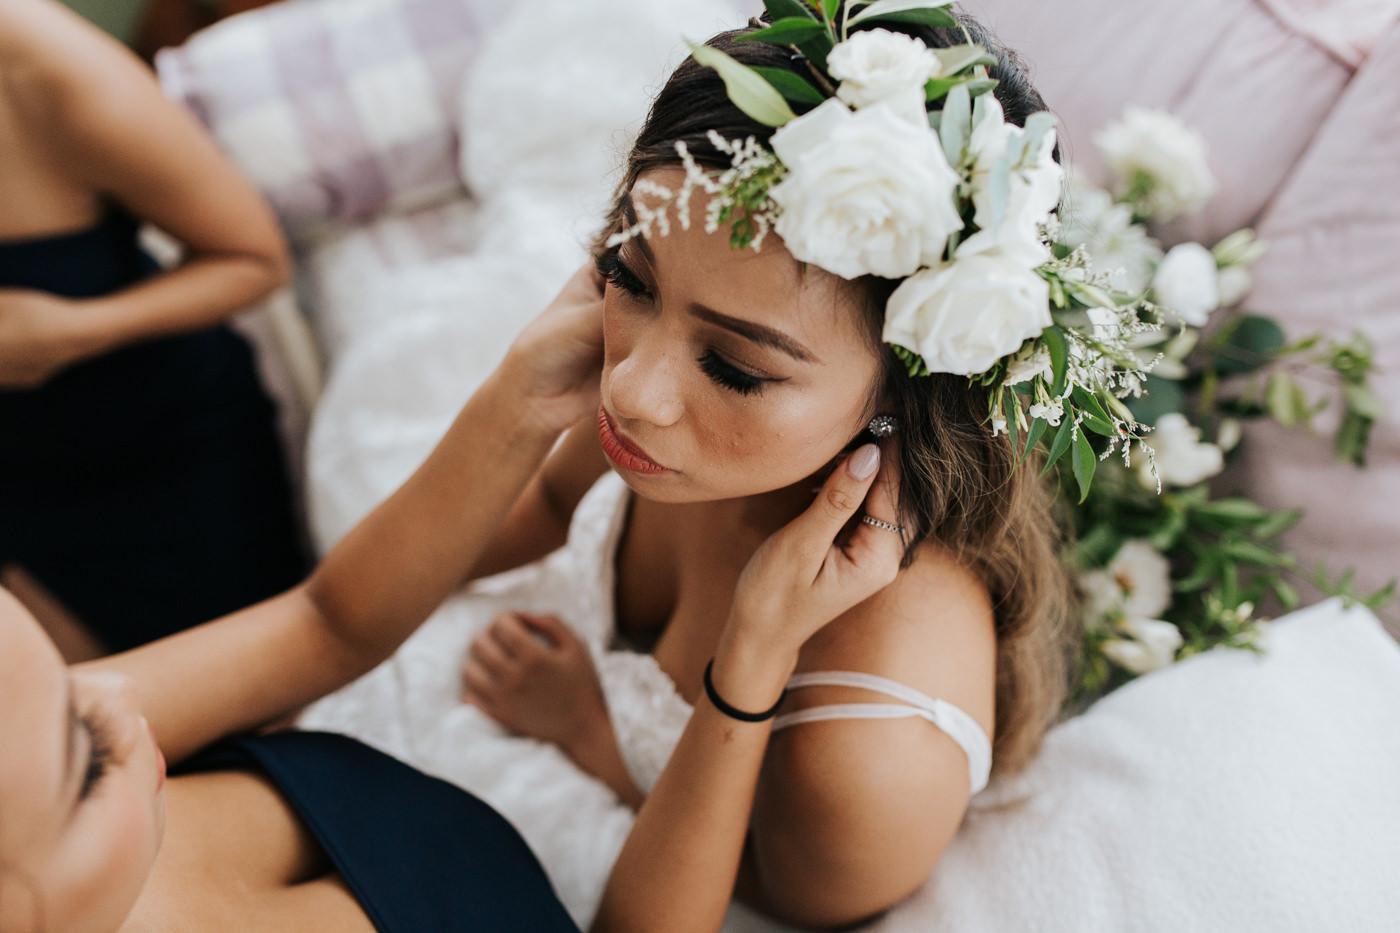 Nick & Vanezza - Fernbank Farm Wedding - Samantha Heather Photography-32.jpg